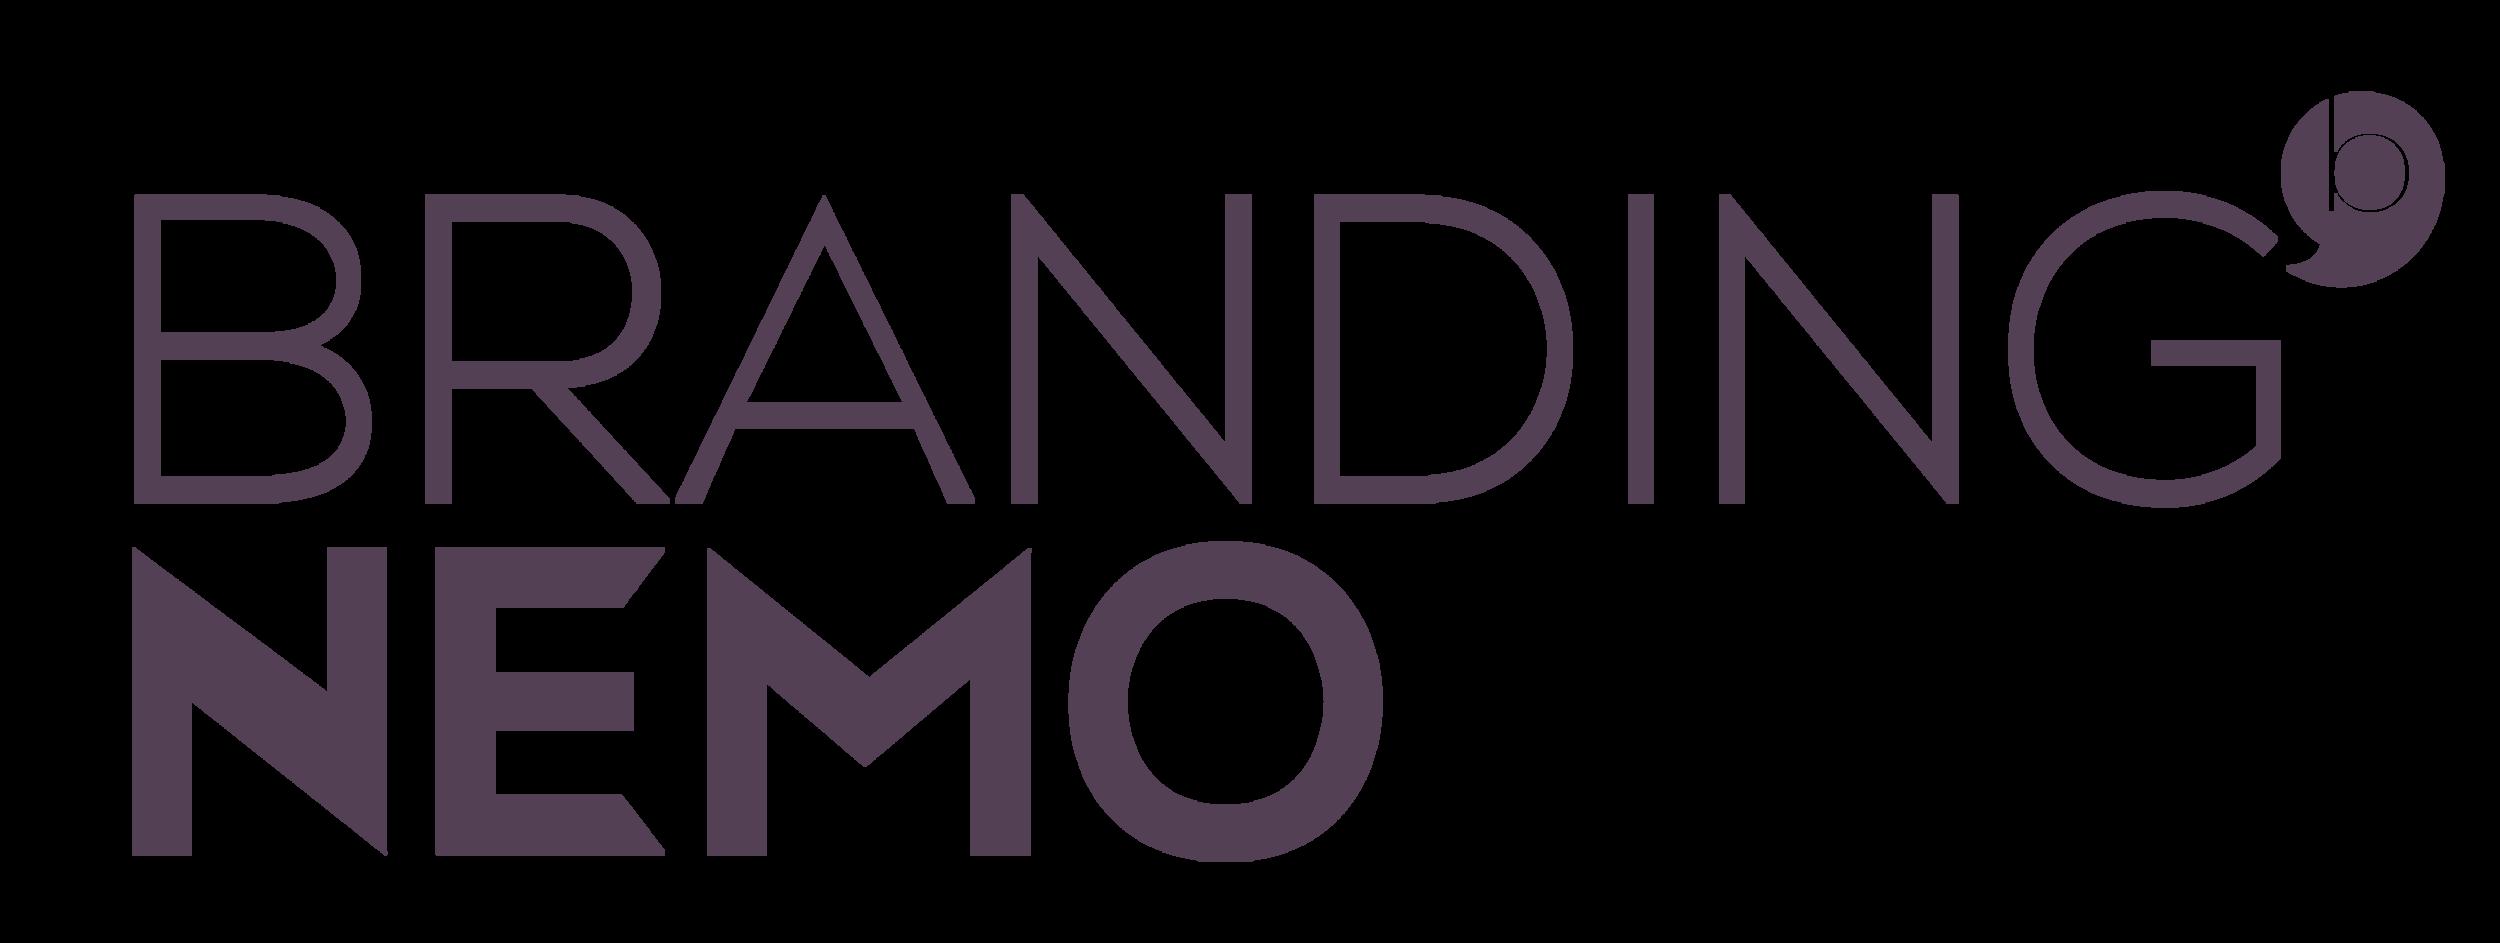 brandingnemo3.png